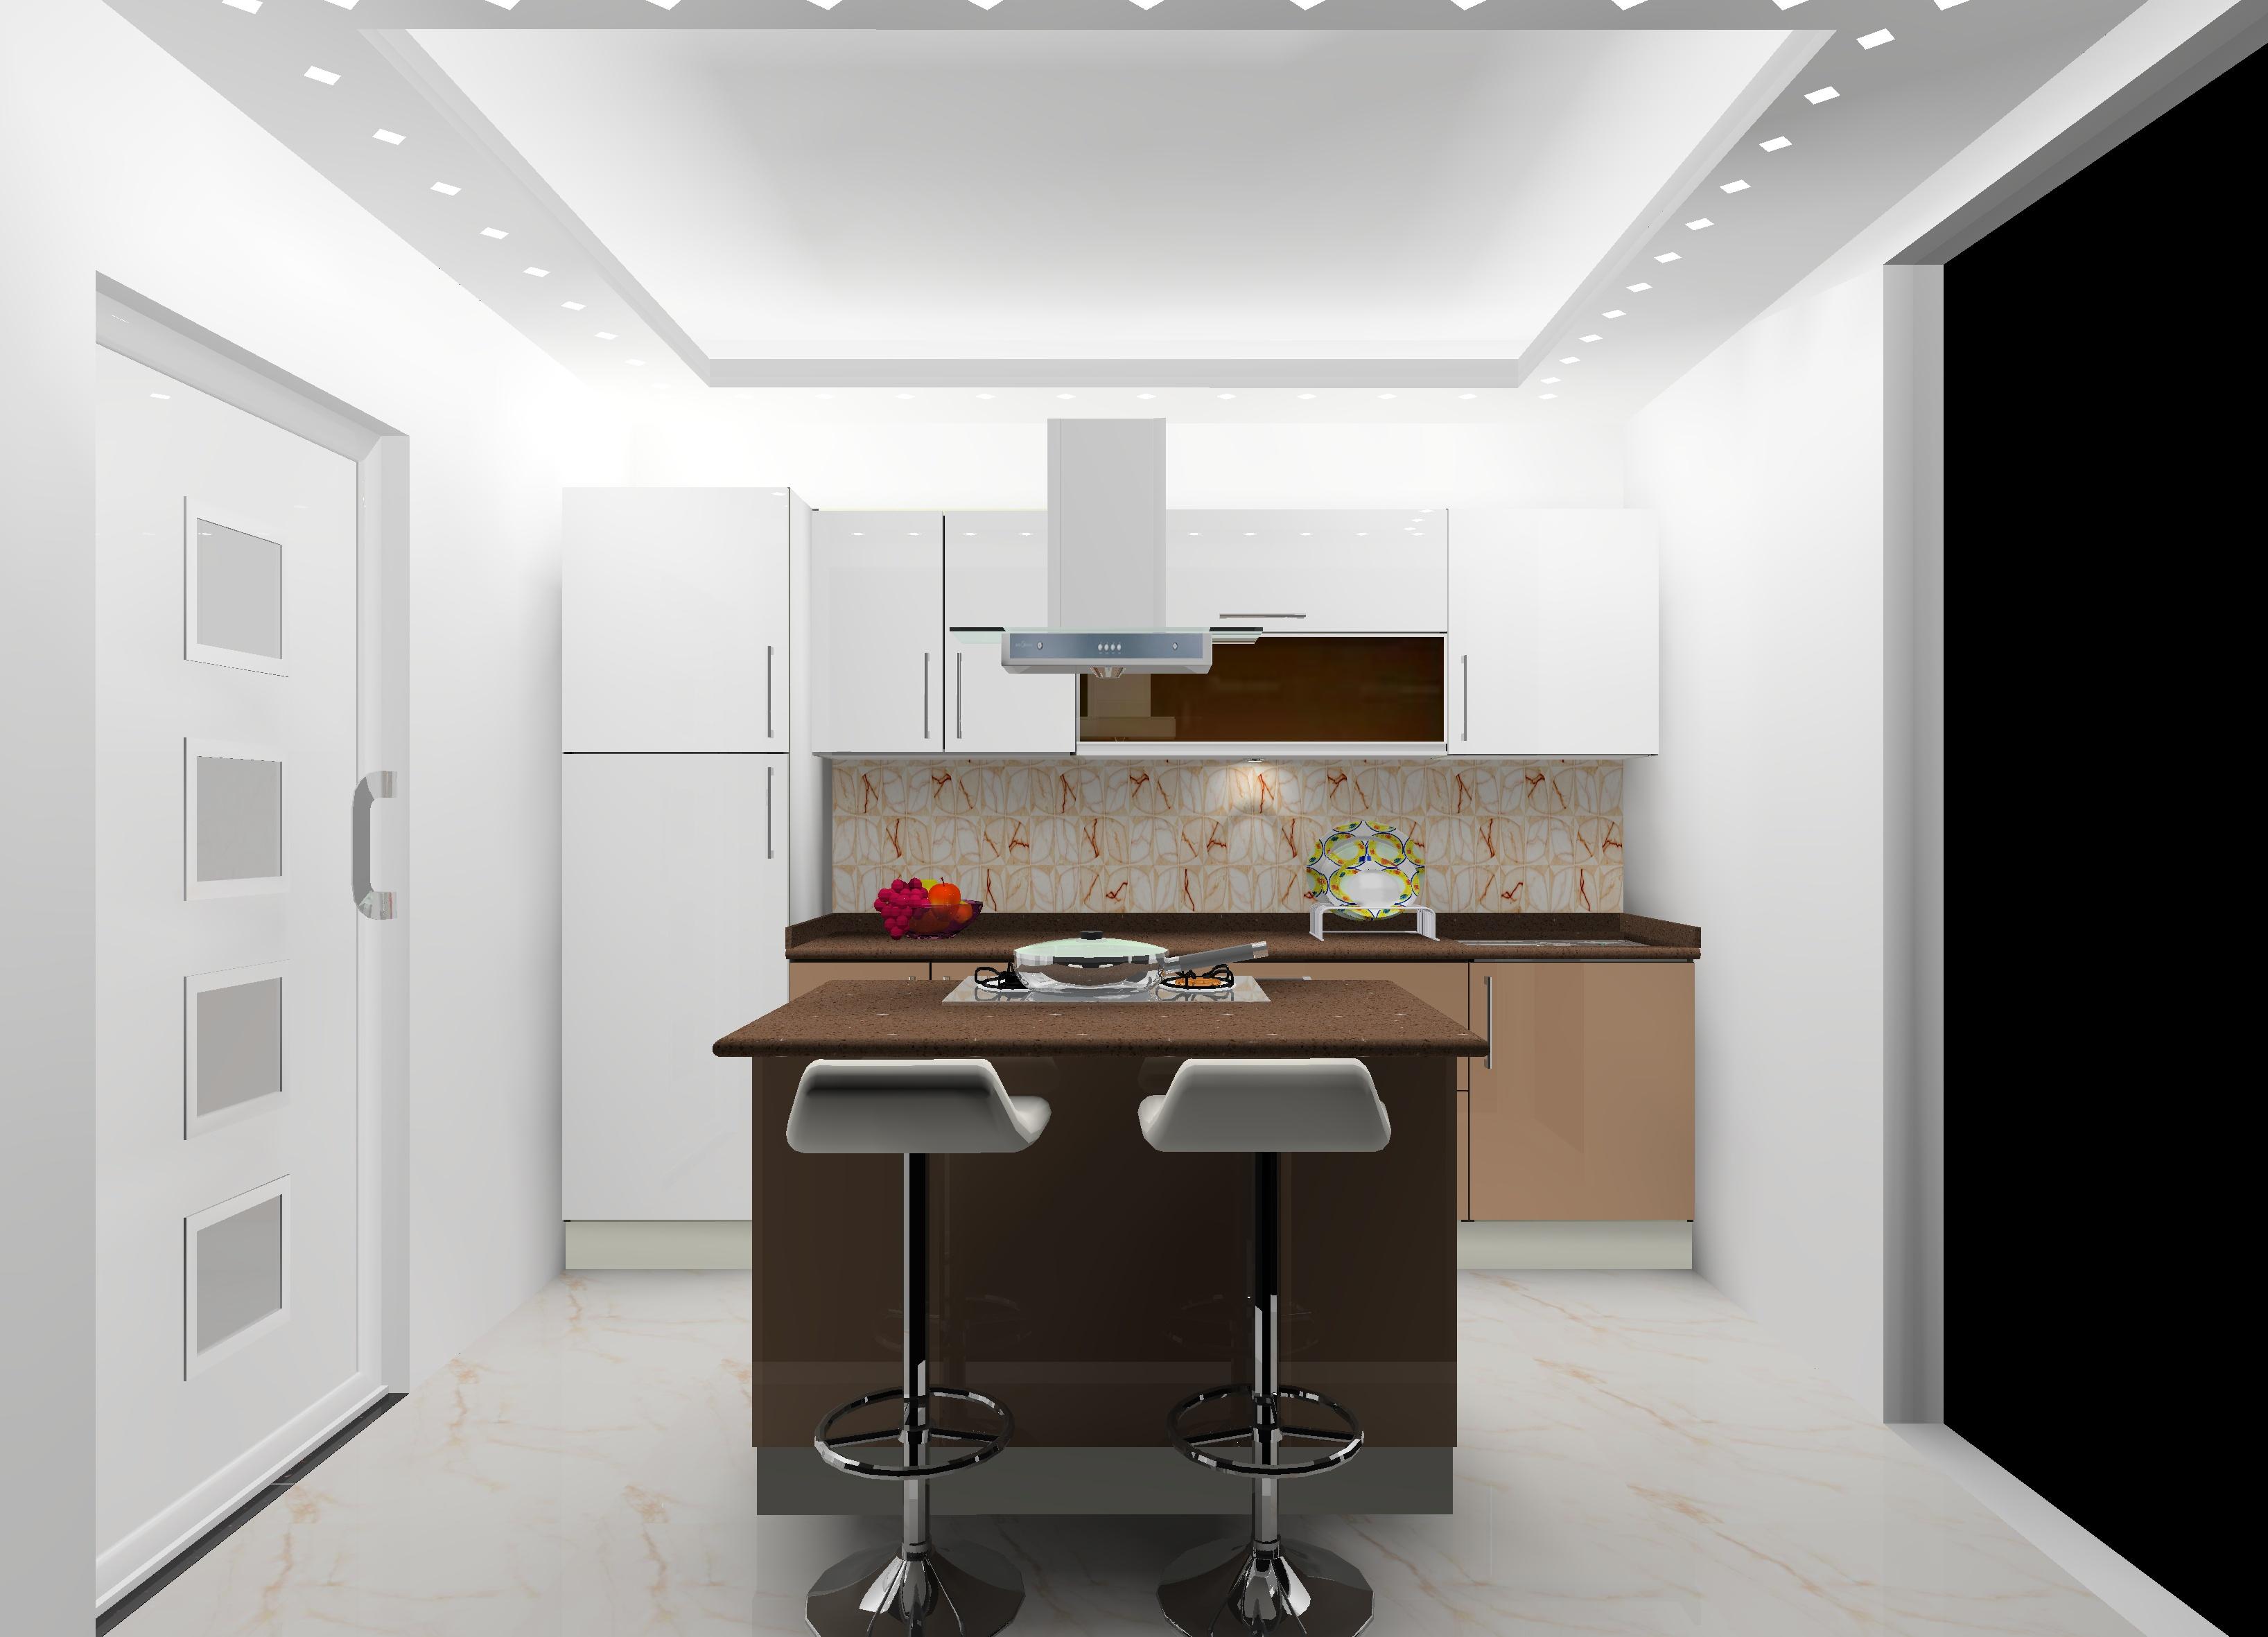 island kitchen  modular kitchens  ideas kitchens